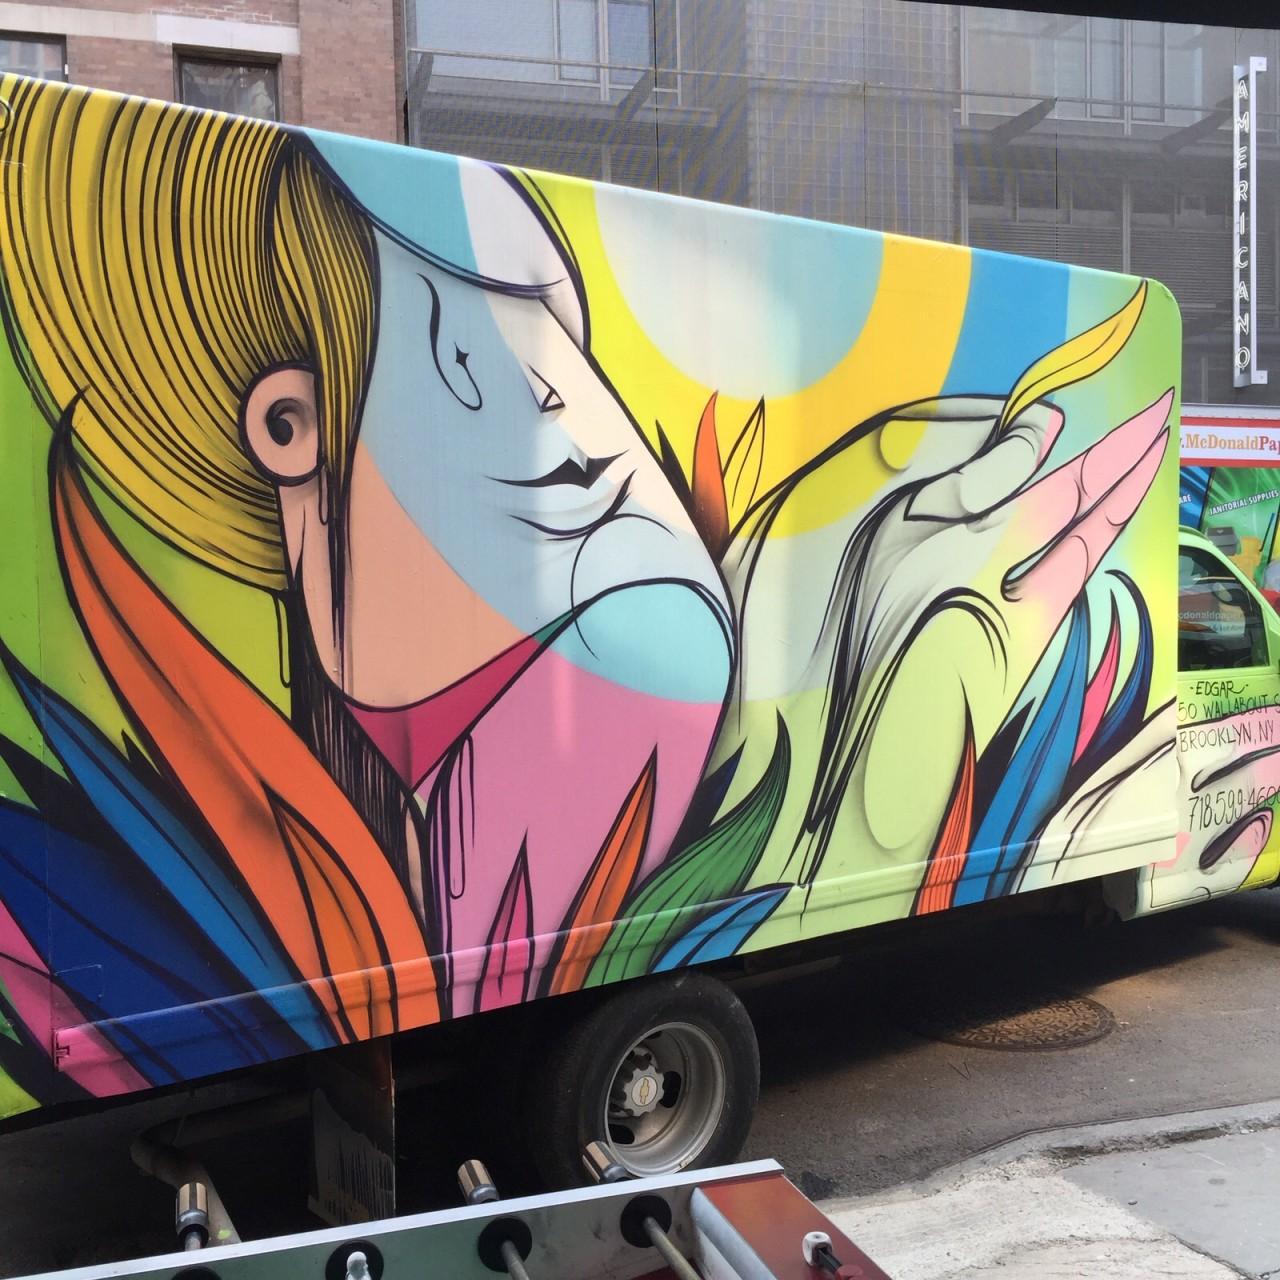 Truck - New York - 2015